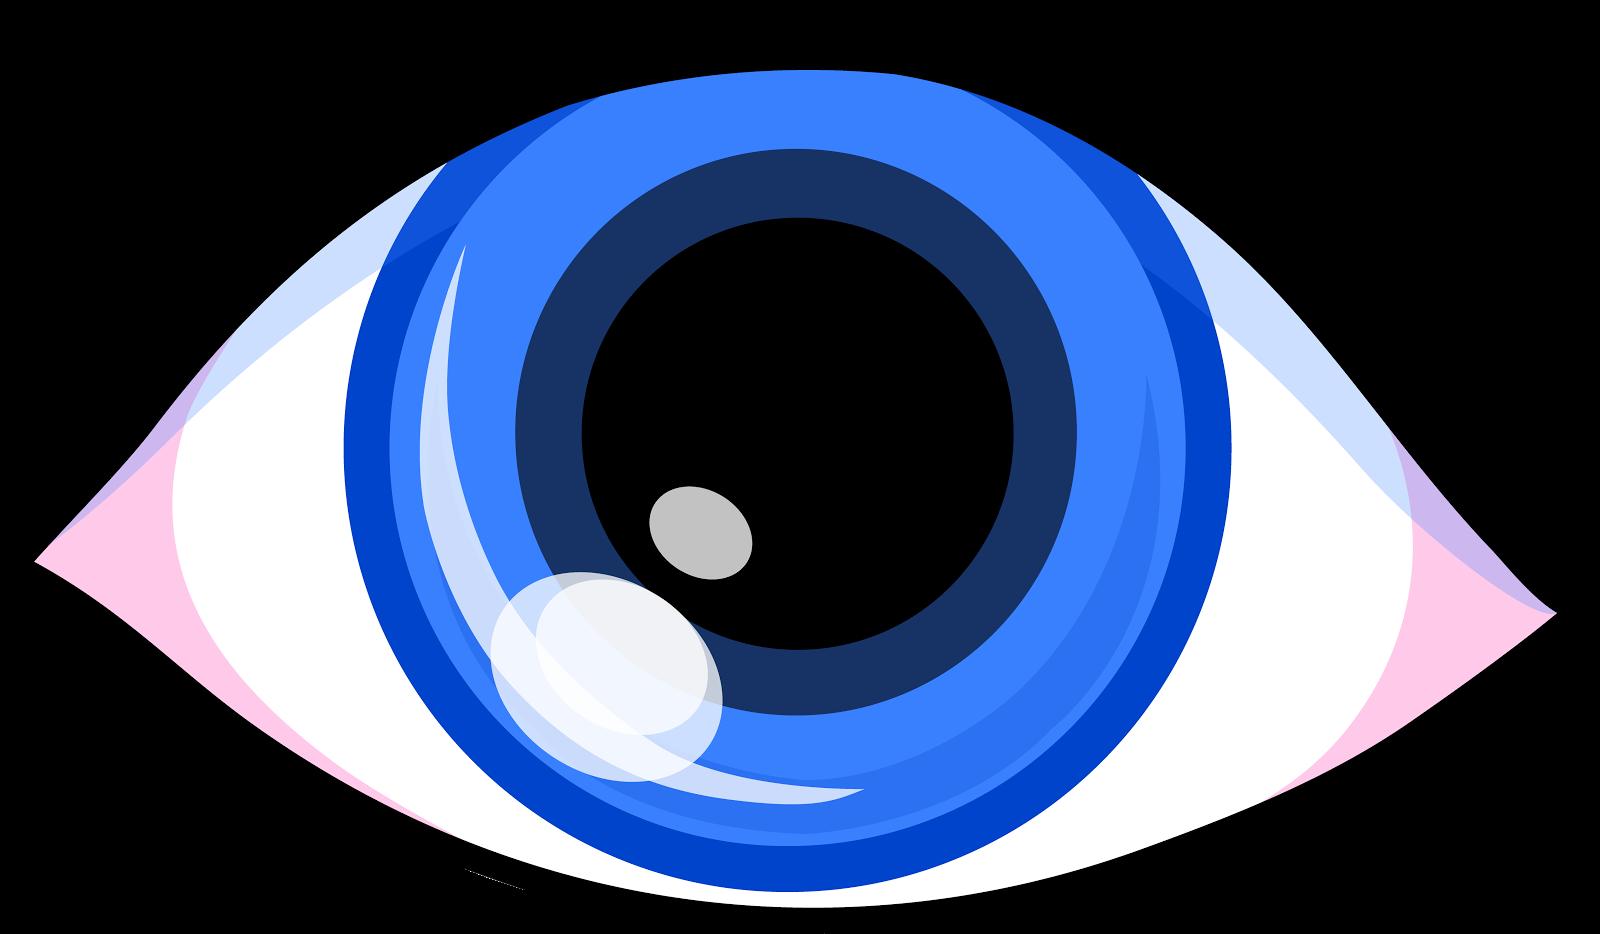 clip art eyes png - photo #6